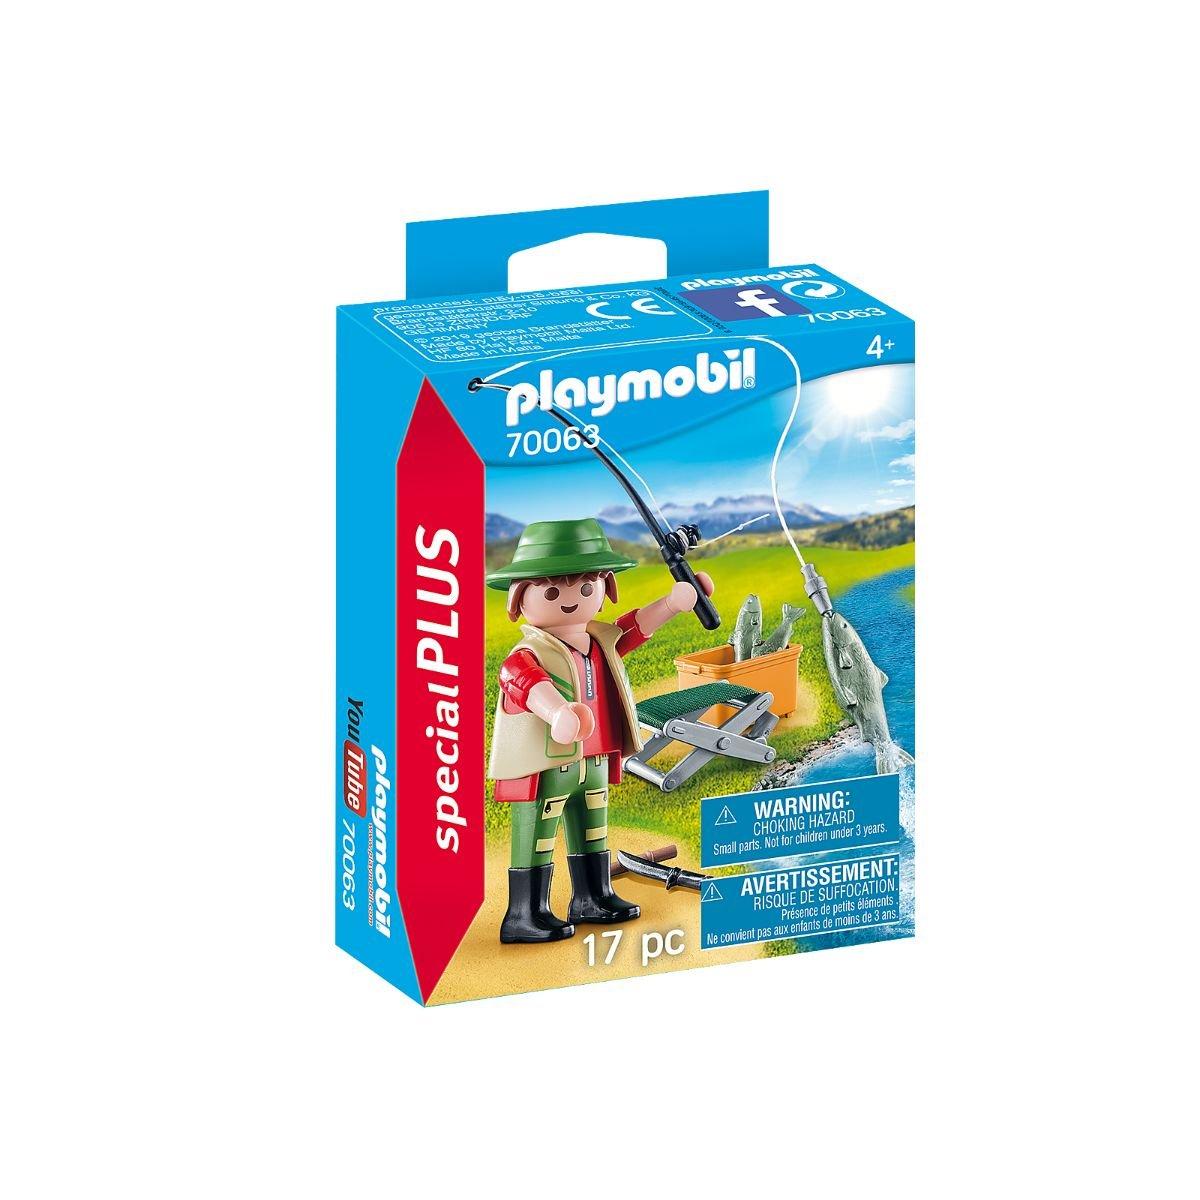 Set Playmobil Figures Special Plus - Figurina pescar